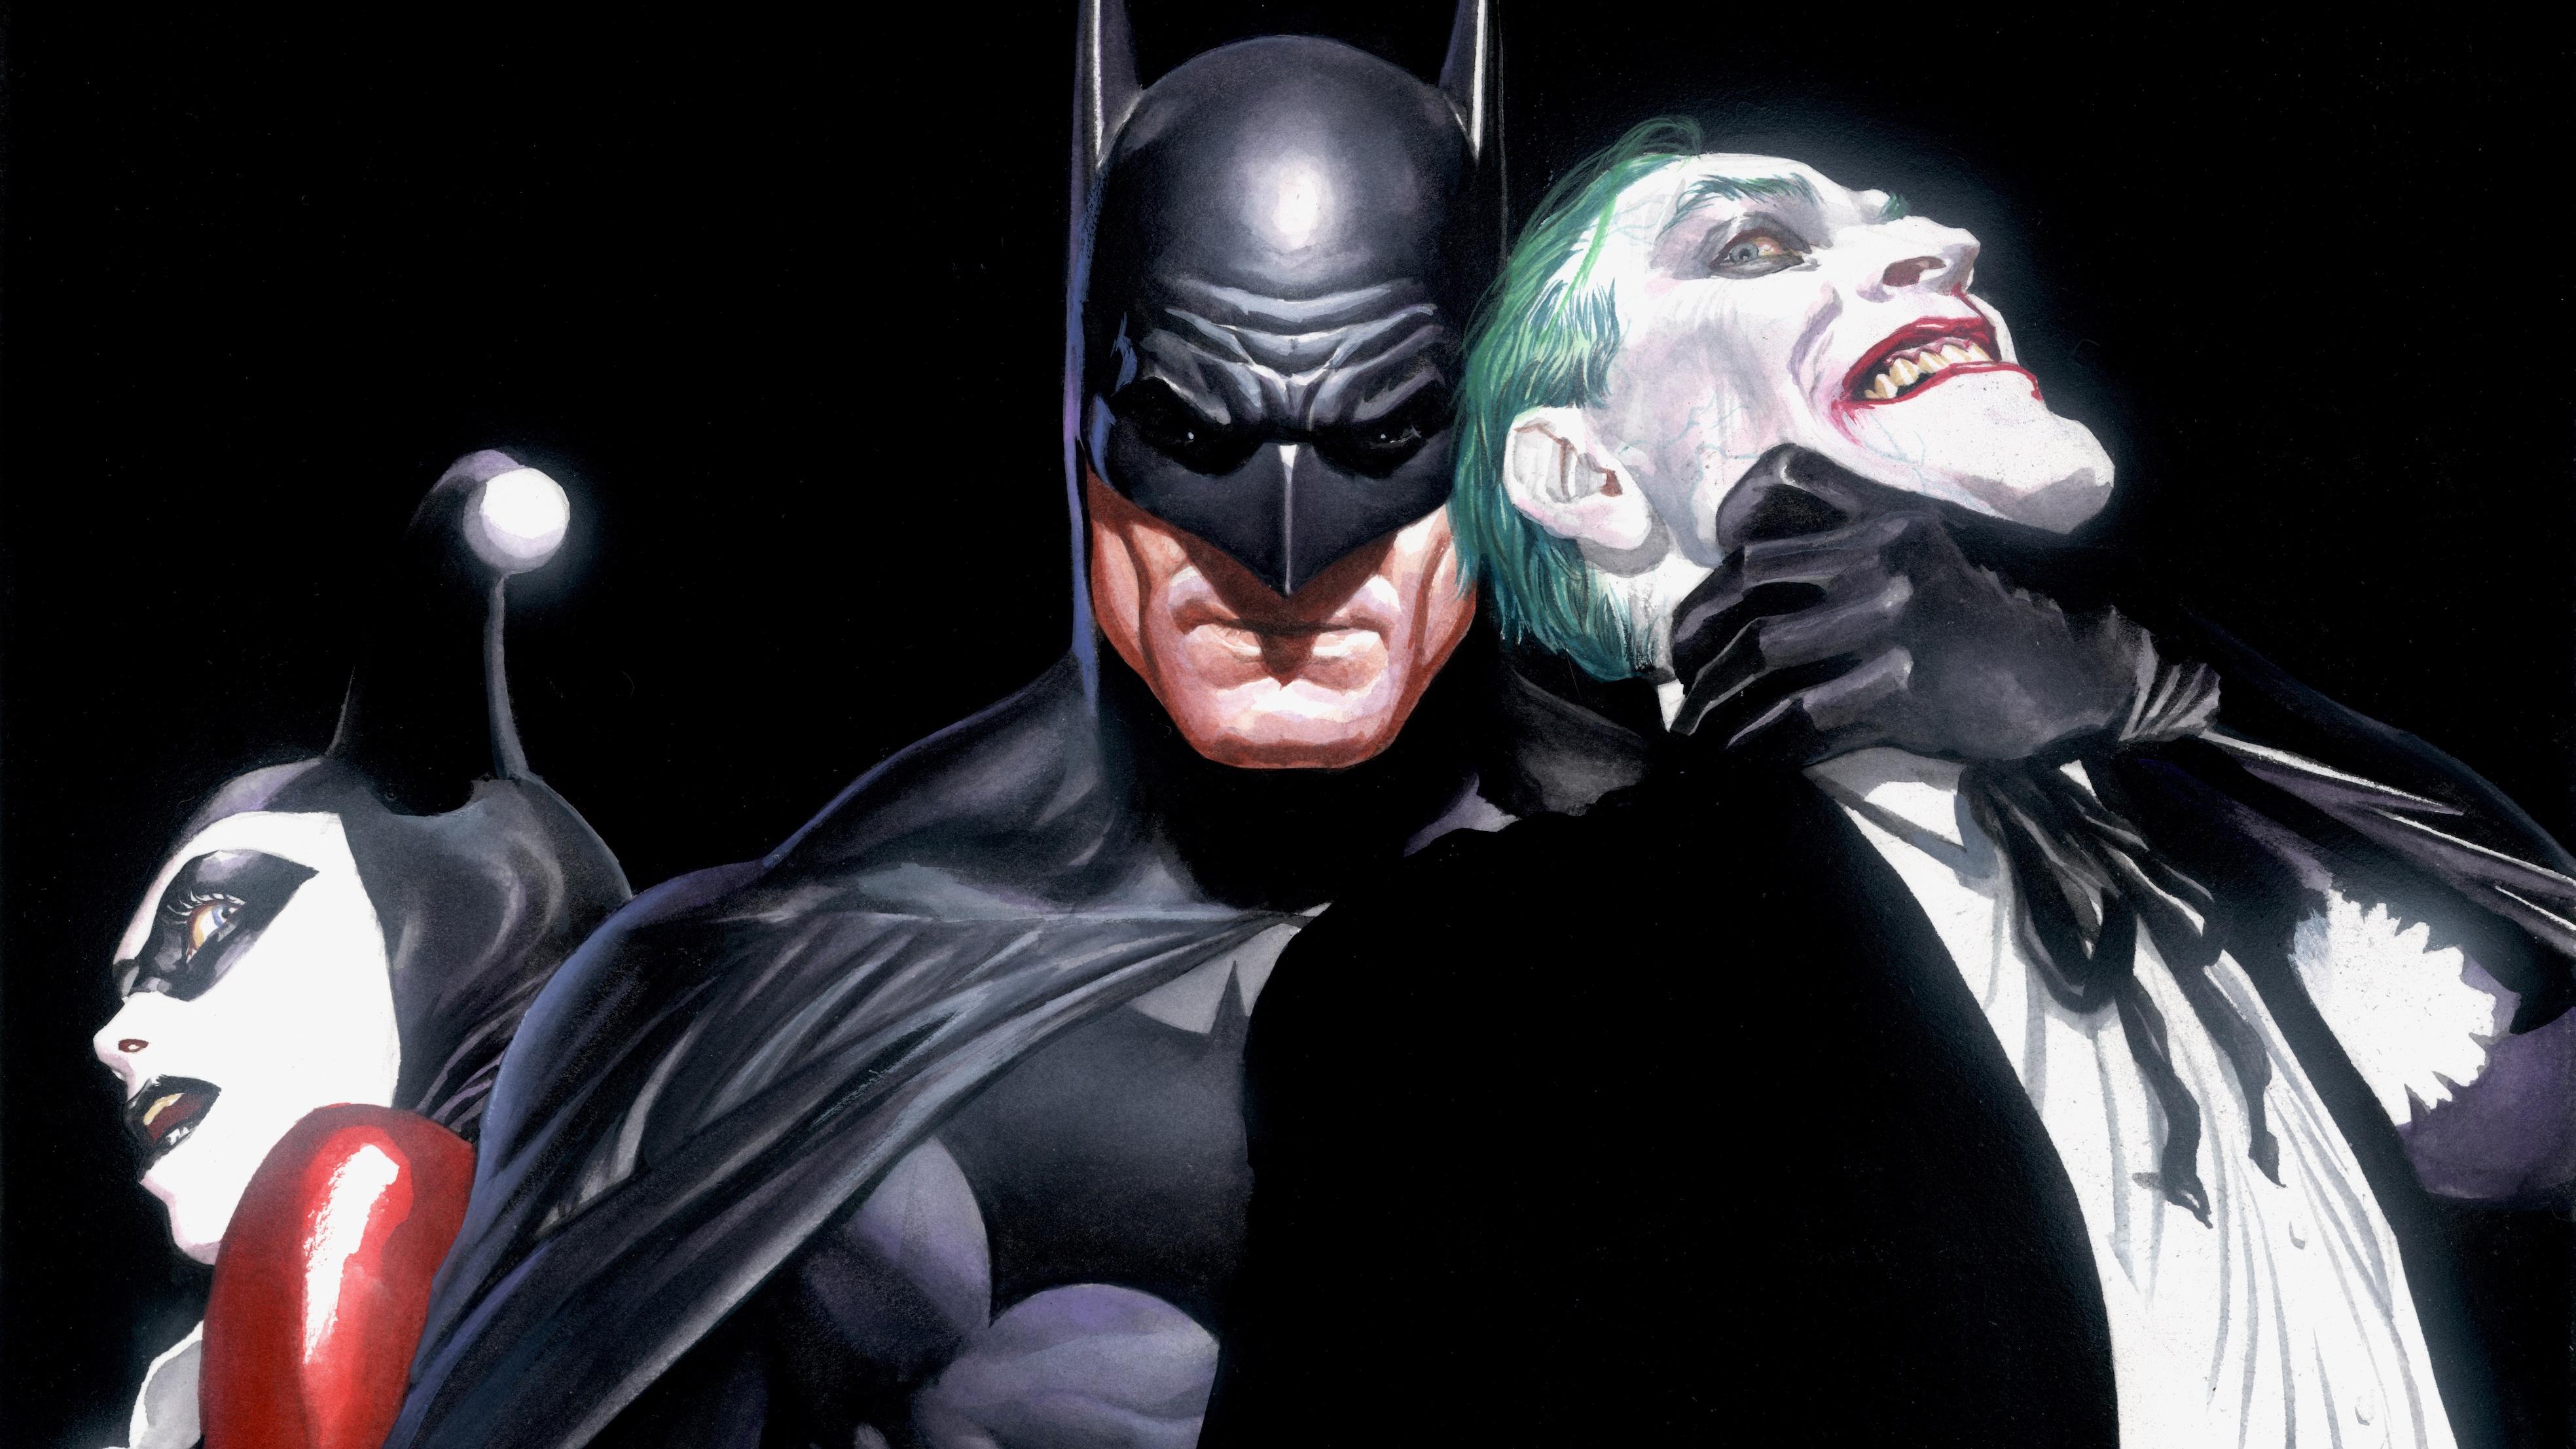 Harley Quinn 4k Hd Wallpapers: Batman Joker Harley Quinn, HD Superheroes, 4k Wallpapers